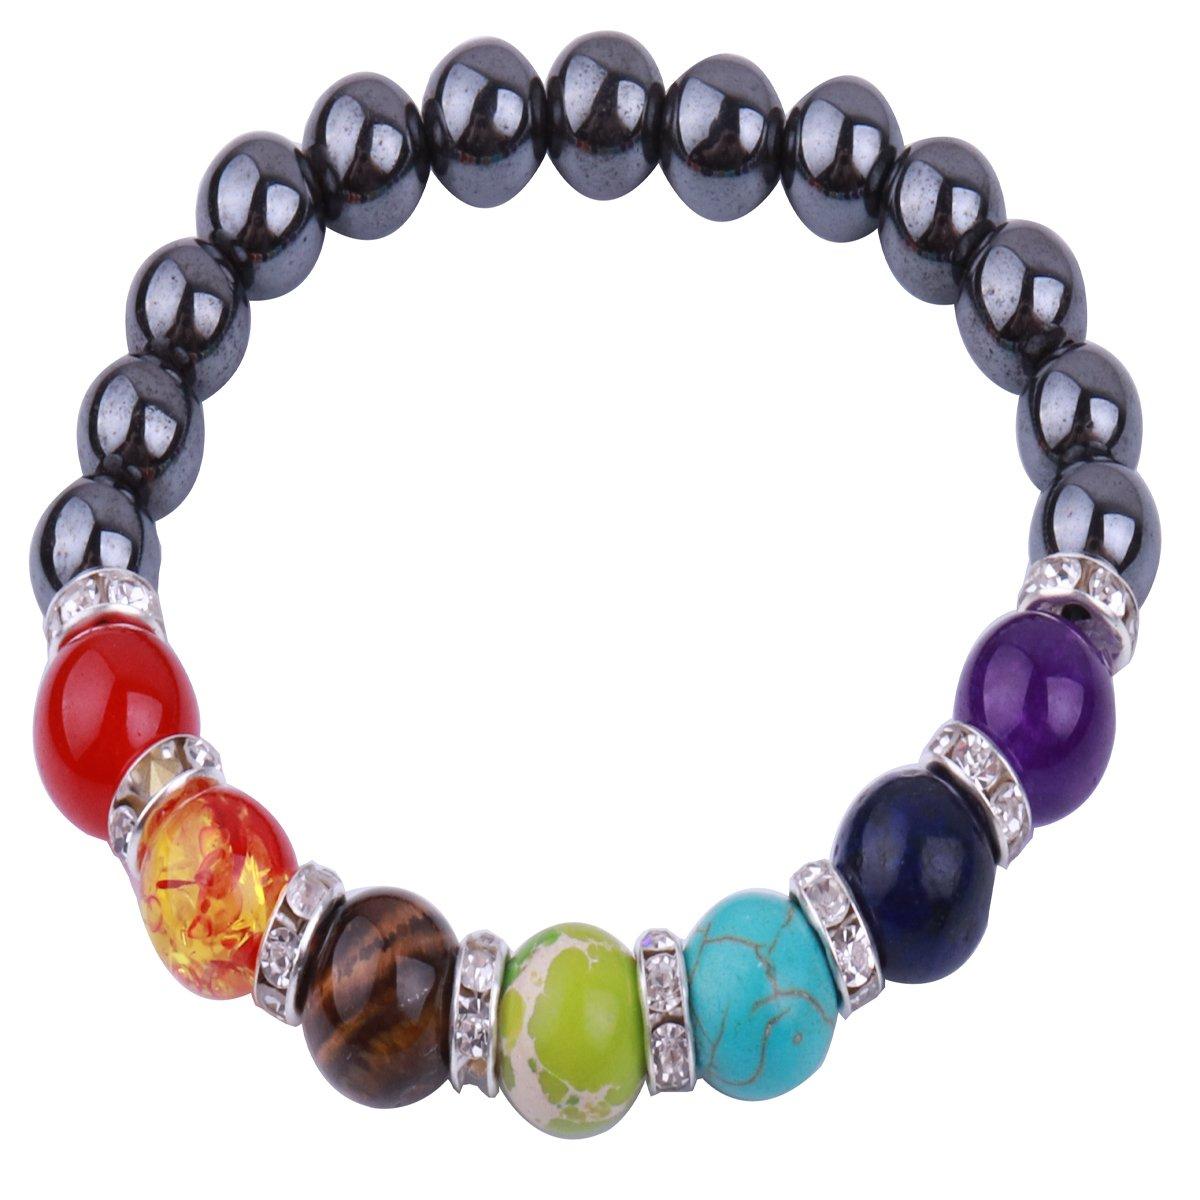 RUNXINTD Chakra Hematite Bracelet Healing Hematite Stretch Jewelry Stone Beaded Bracedlet 8MM (Hematite Bracelet)